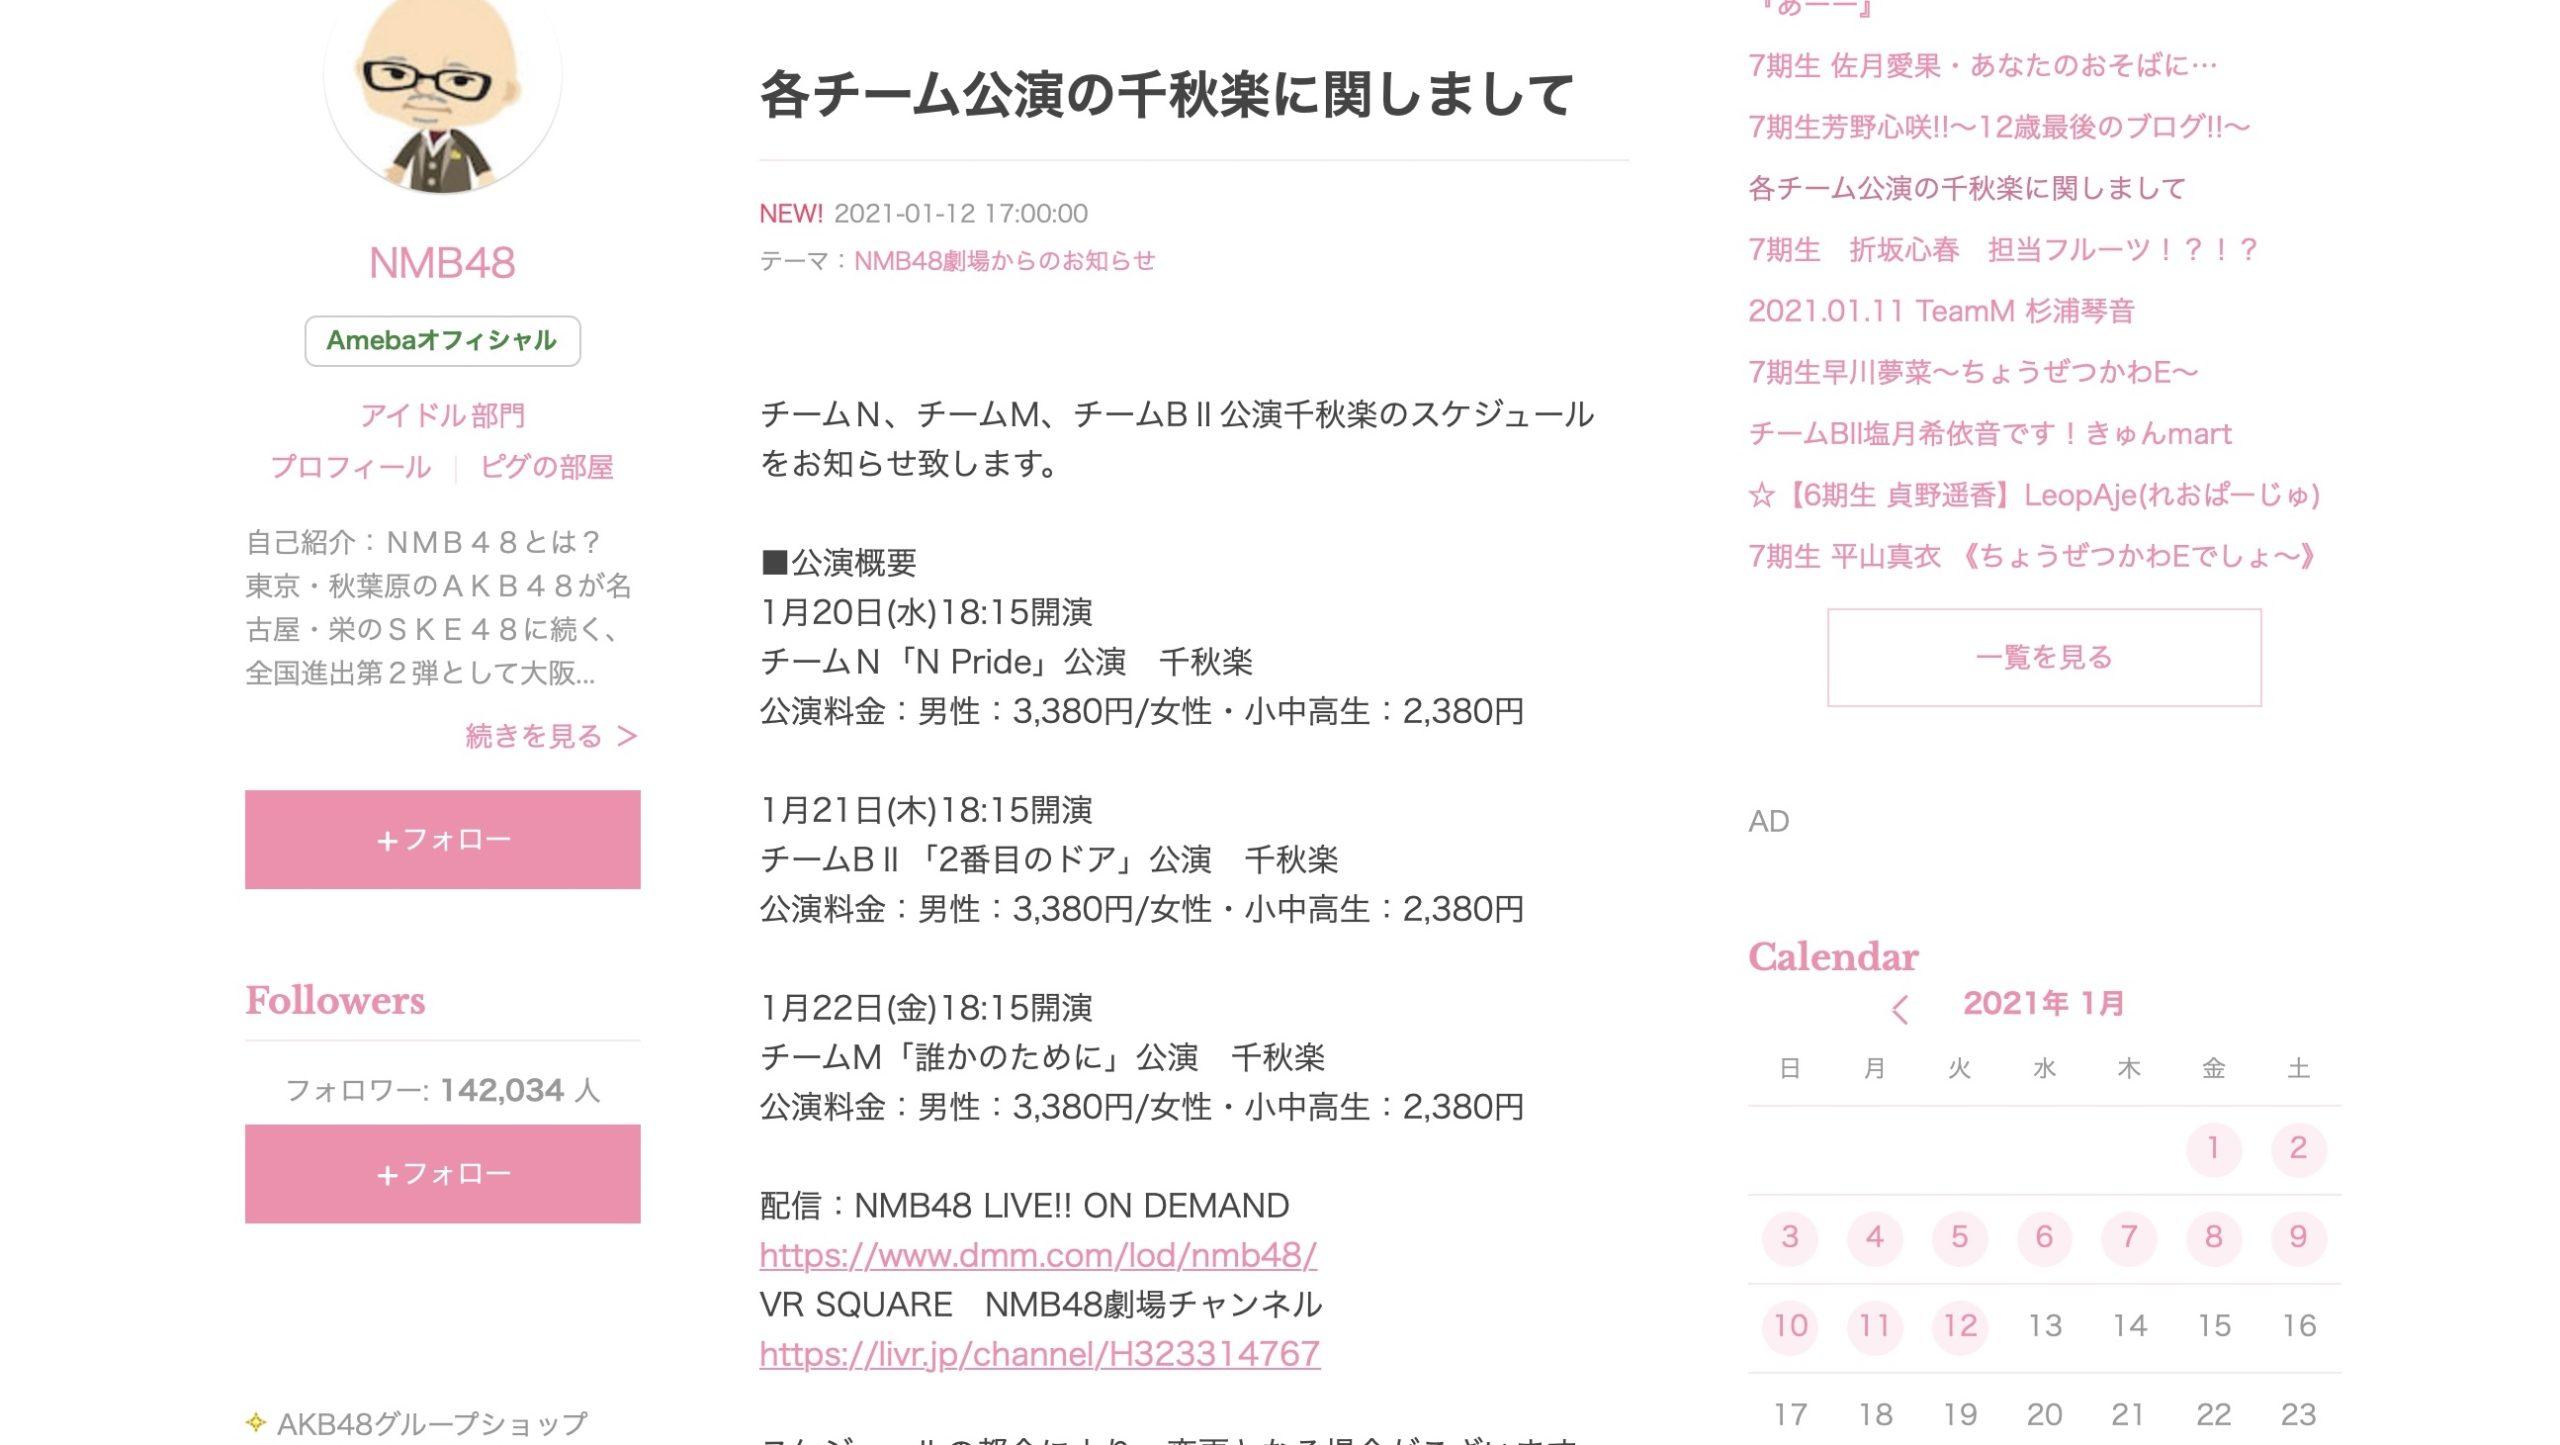 【NMB48】現行チームの千秋楽が発表